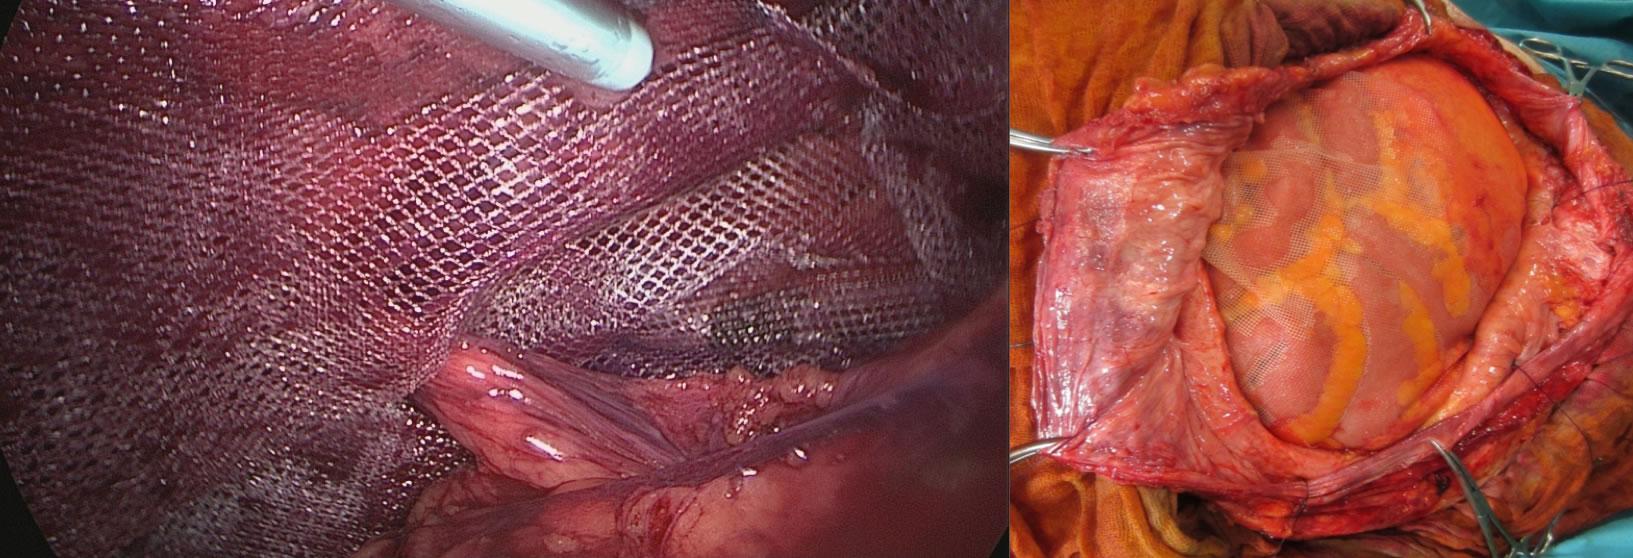 operacion de hernia del ombligo